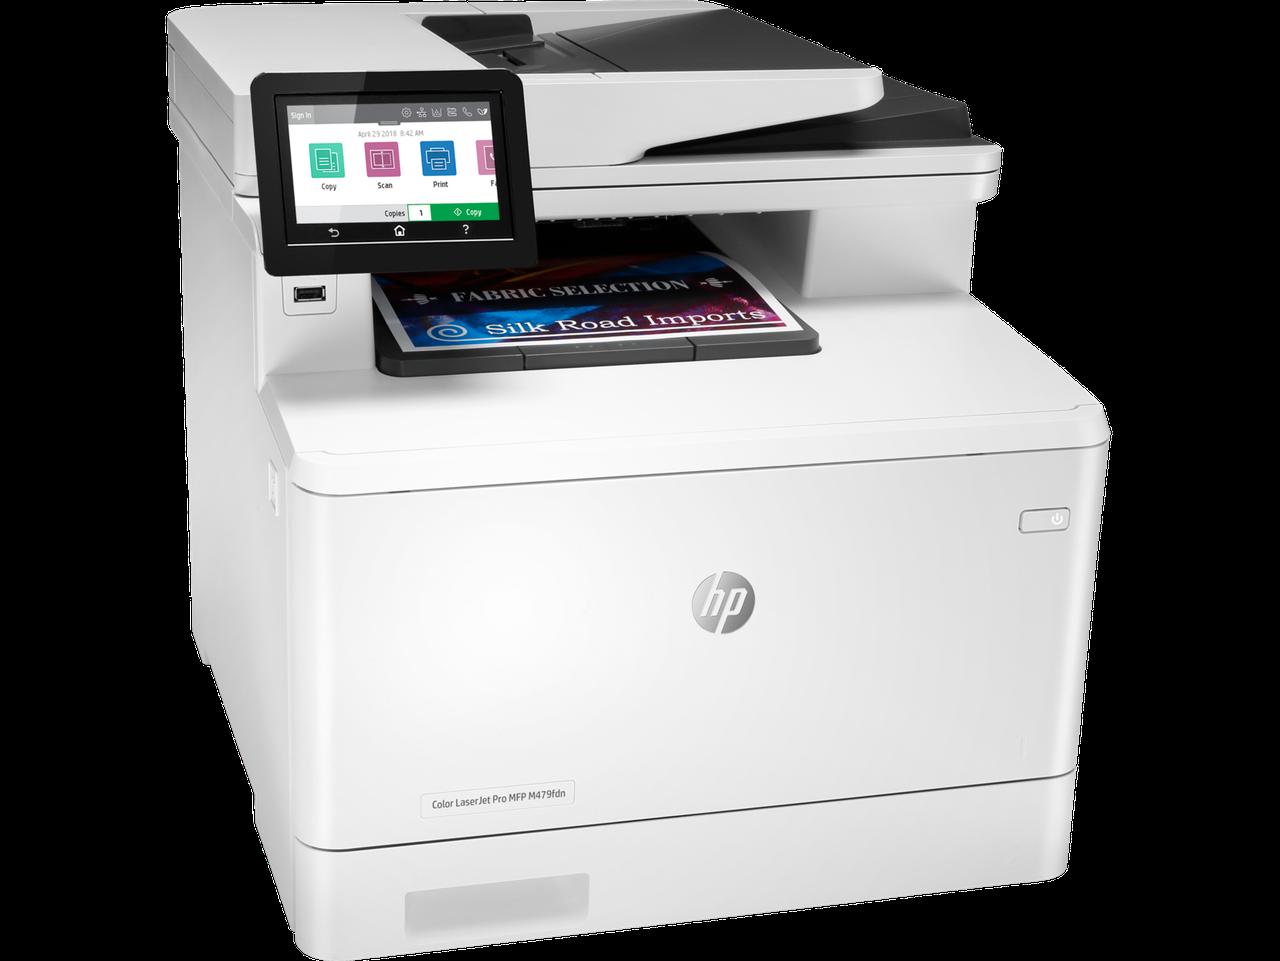 МФУHP W1A79A HP Color LaserJet Pro MFP M479fdn Prntr (A4) , Printer/Scanner/Copier/Fax/ADF, 600 dpi, 27 ppm,